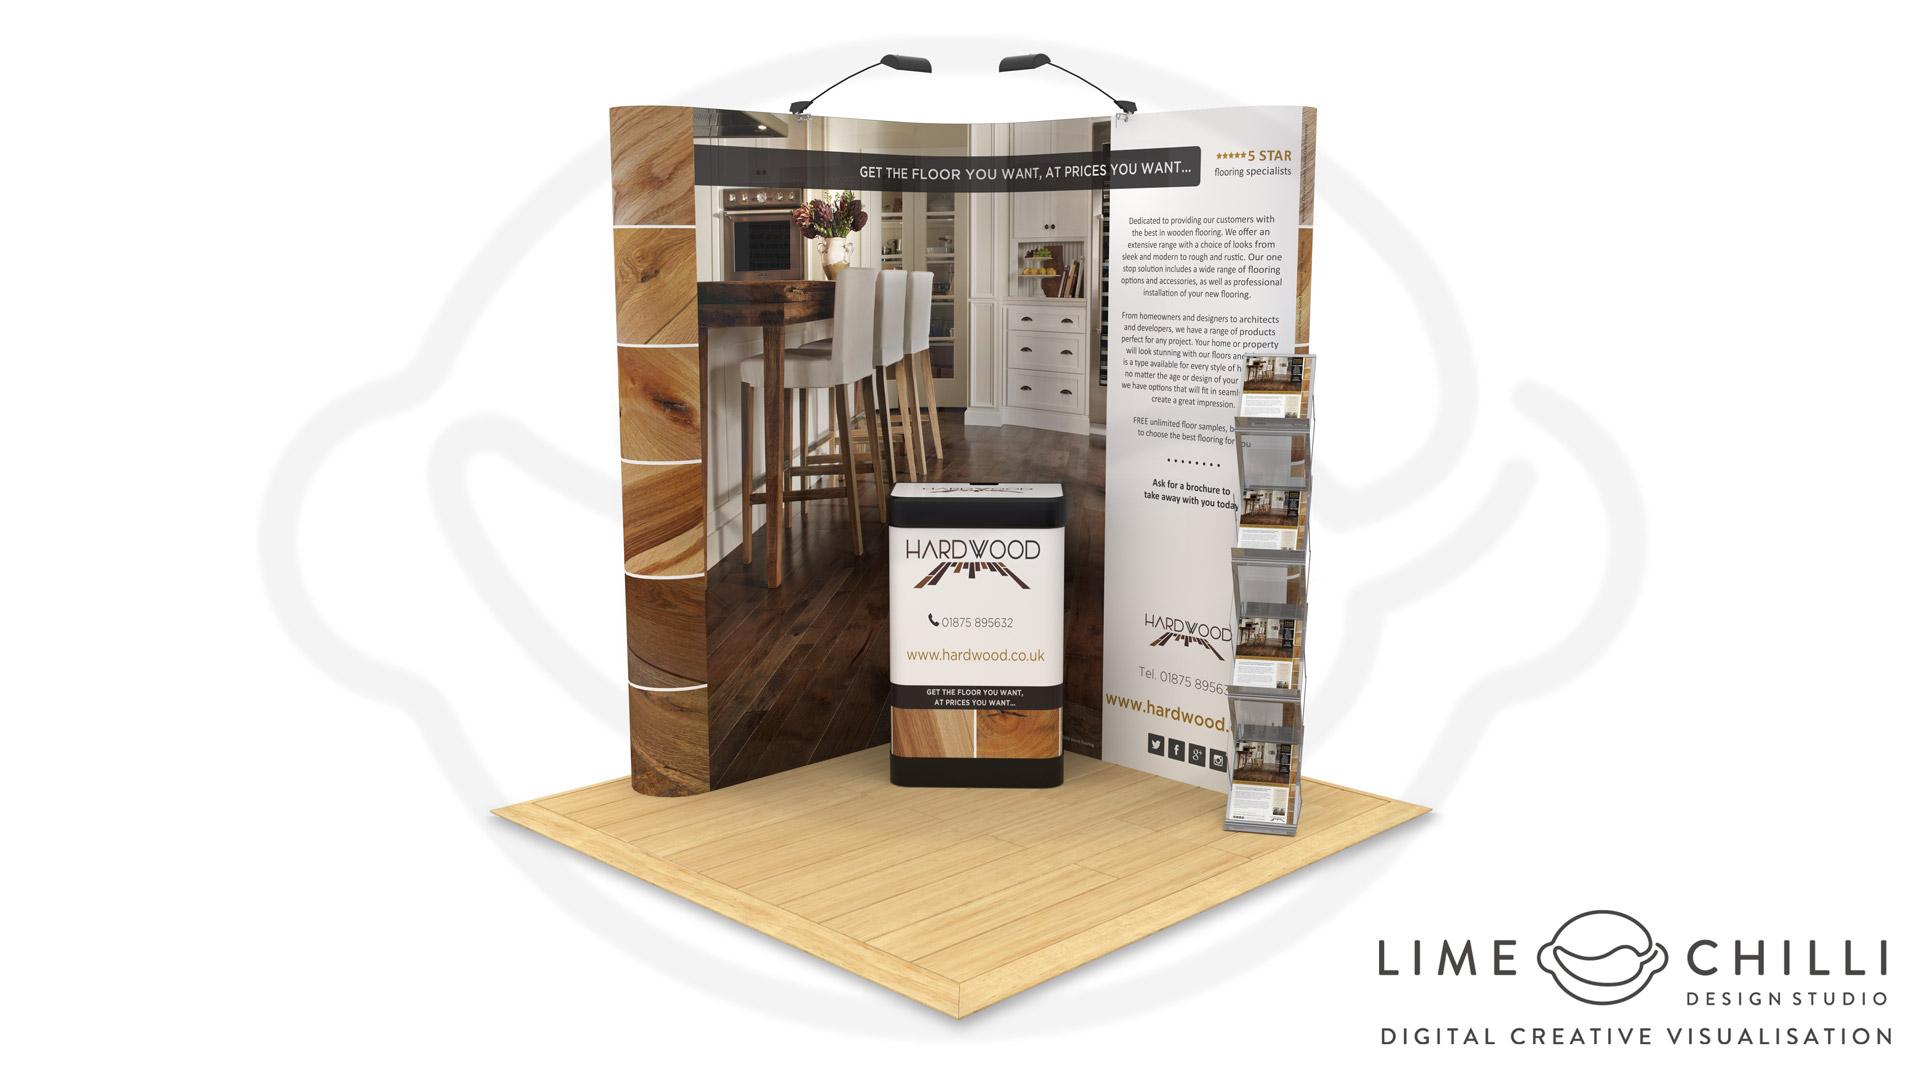 Exhibition Stand Visualisation : Lime and chilli design studio portfolio